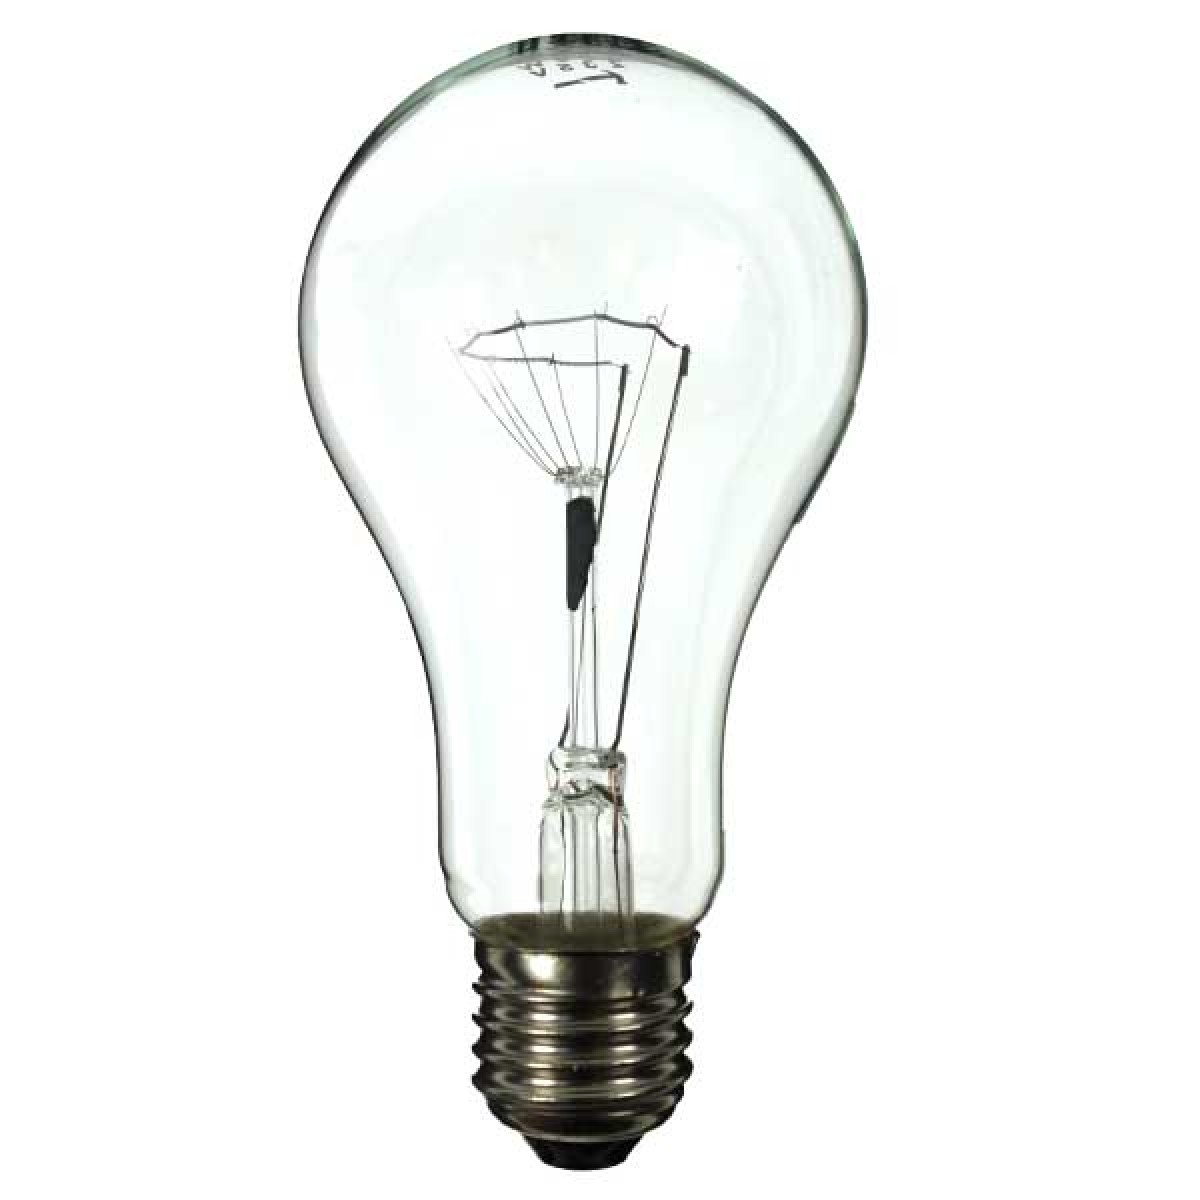 Gls Light Bulb 240v 200w E27 Clear